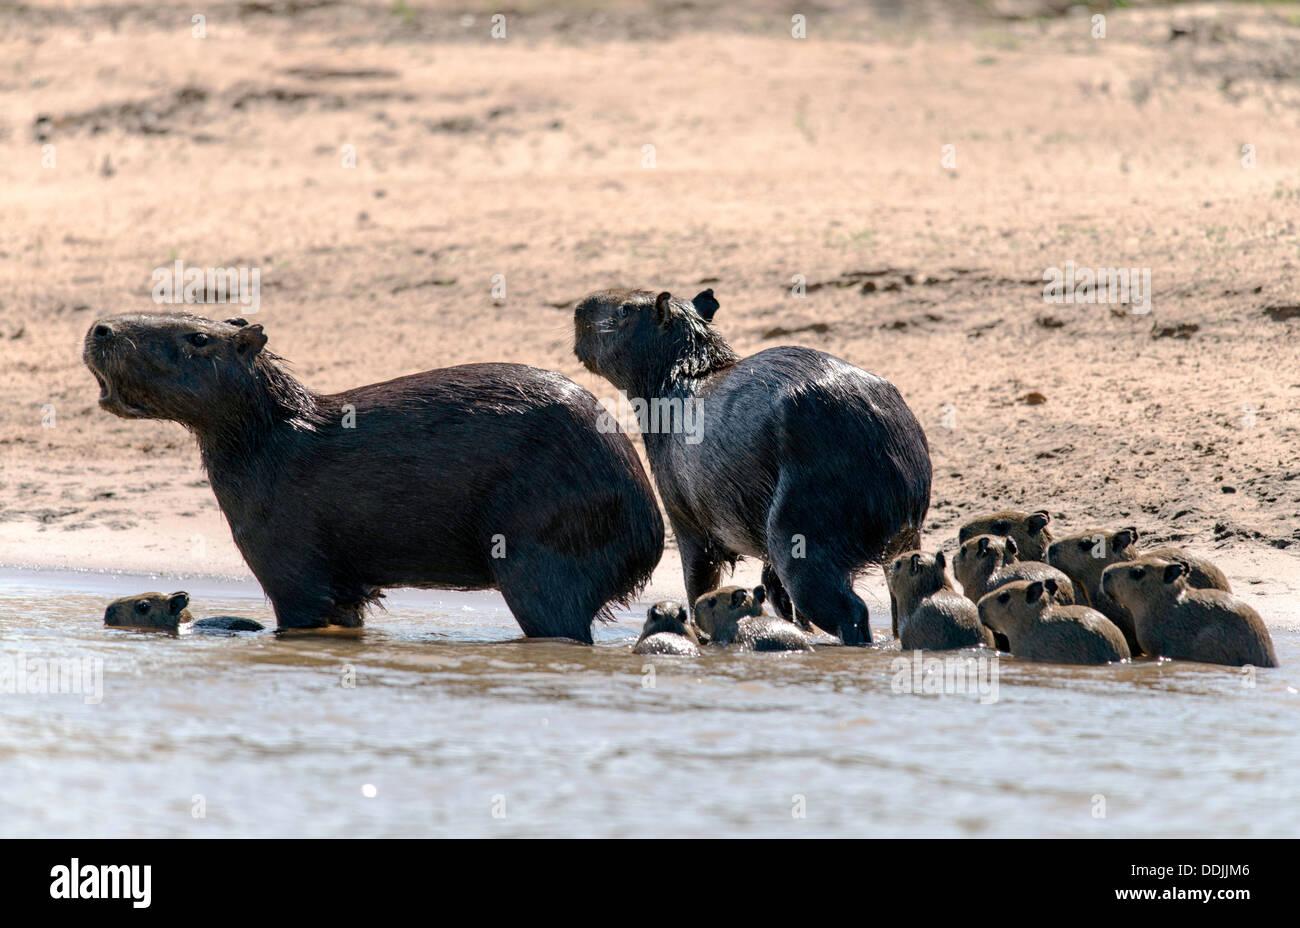 Family of Capybara (Hydrochoerus hydrochaeris) in the Three Brothers river Porto Jofre Pantanal Mato Grosso Brazil Stock Photo